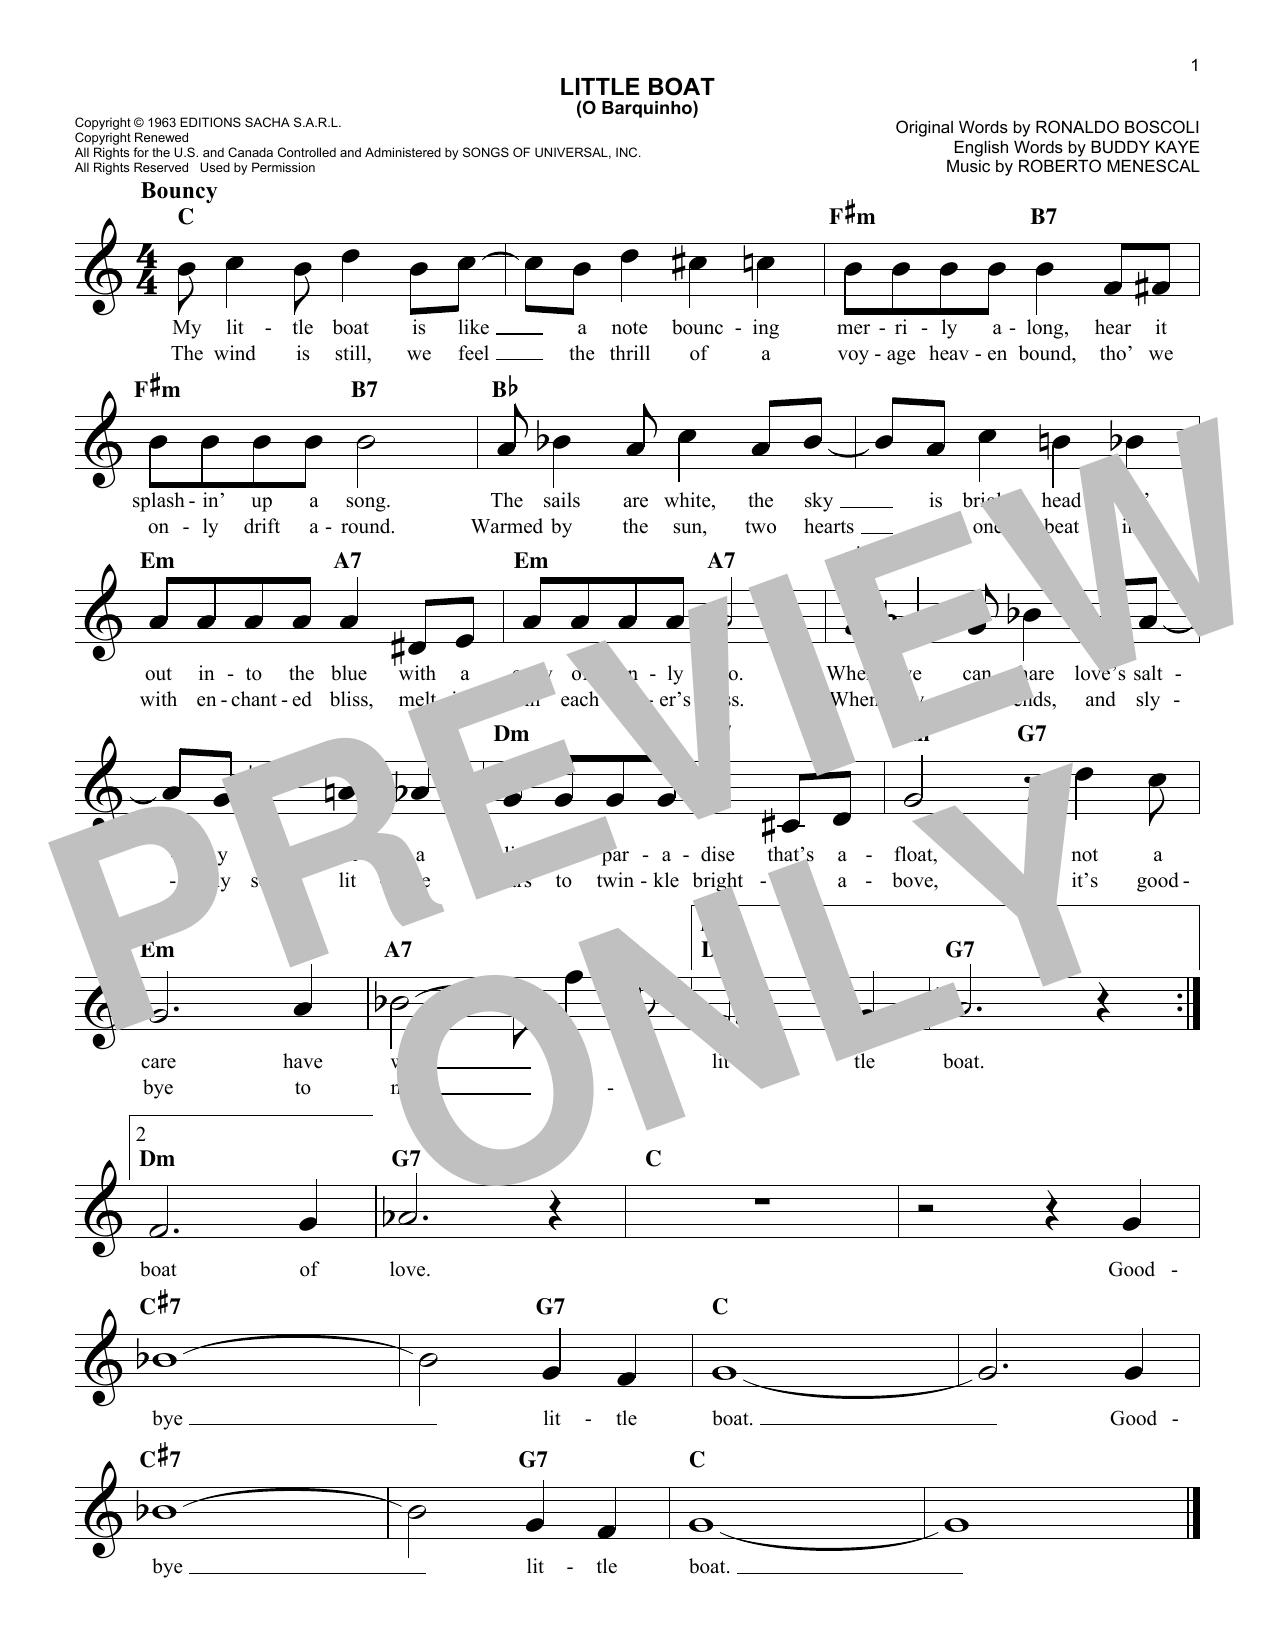 Little Boat (O Barquinho) sheet music